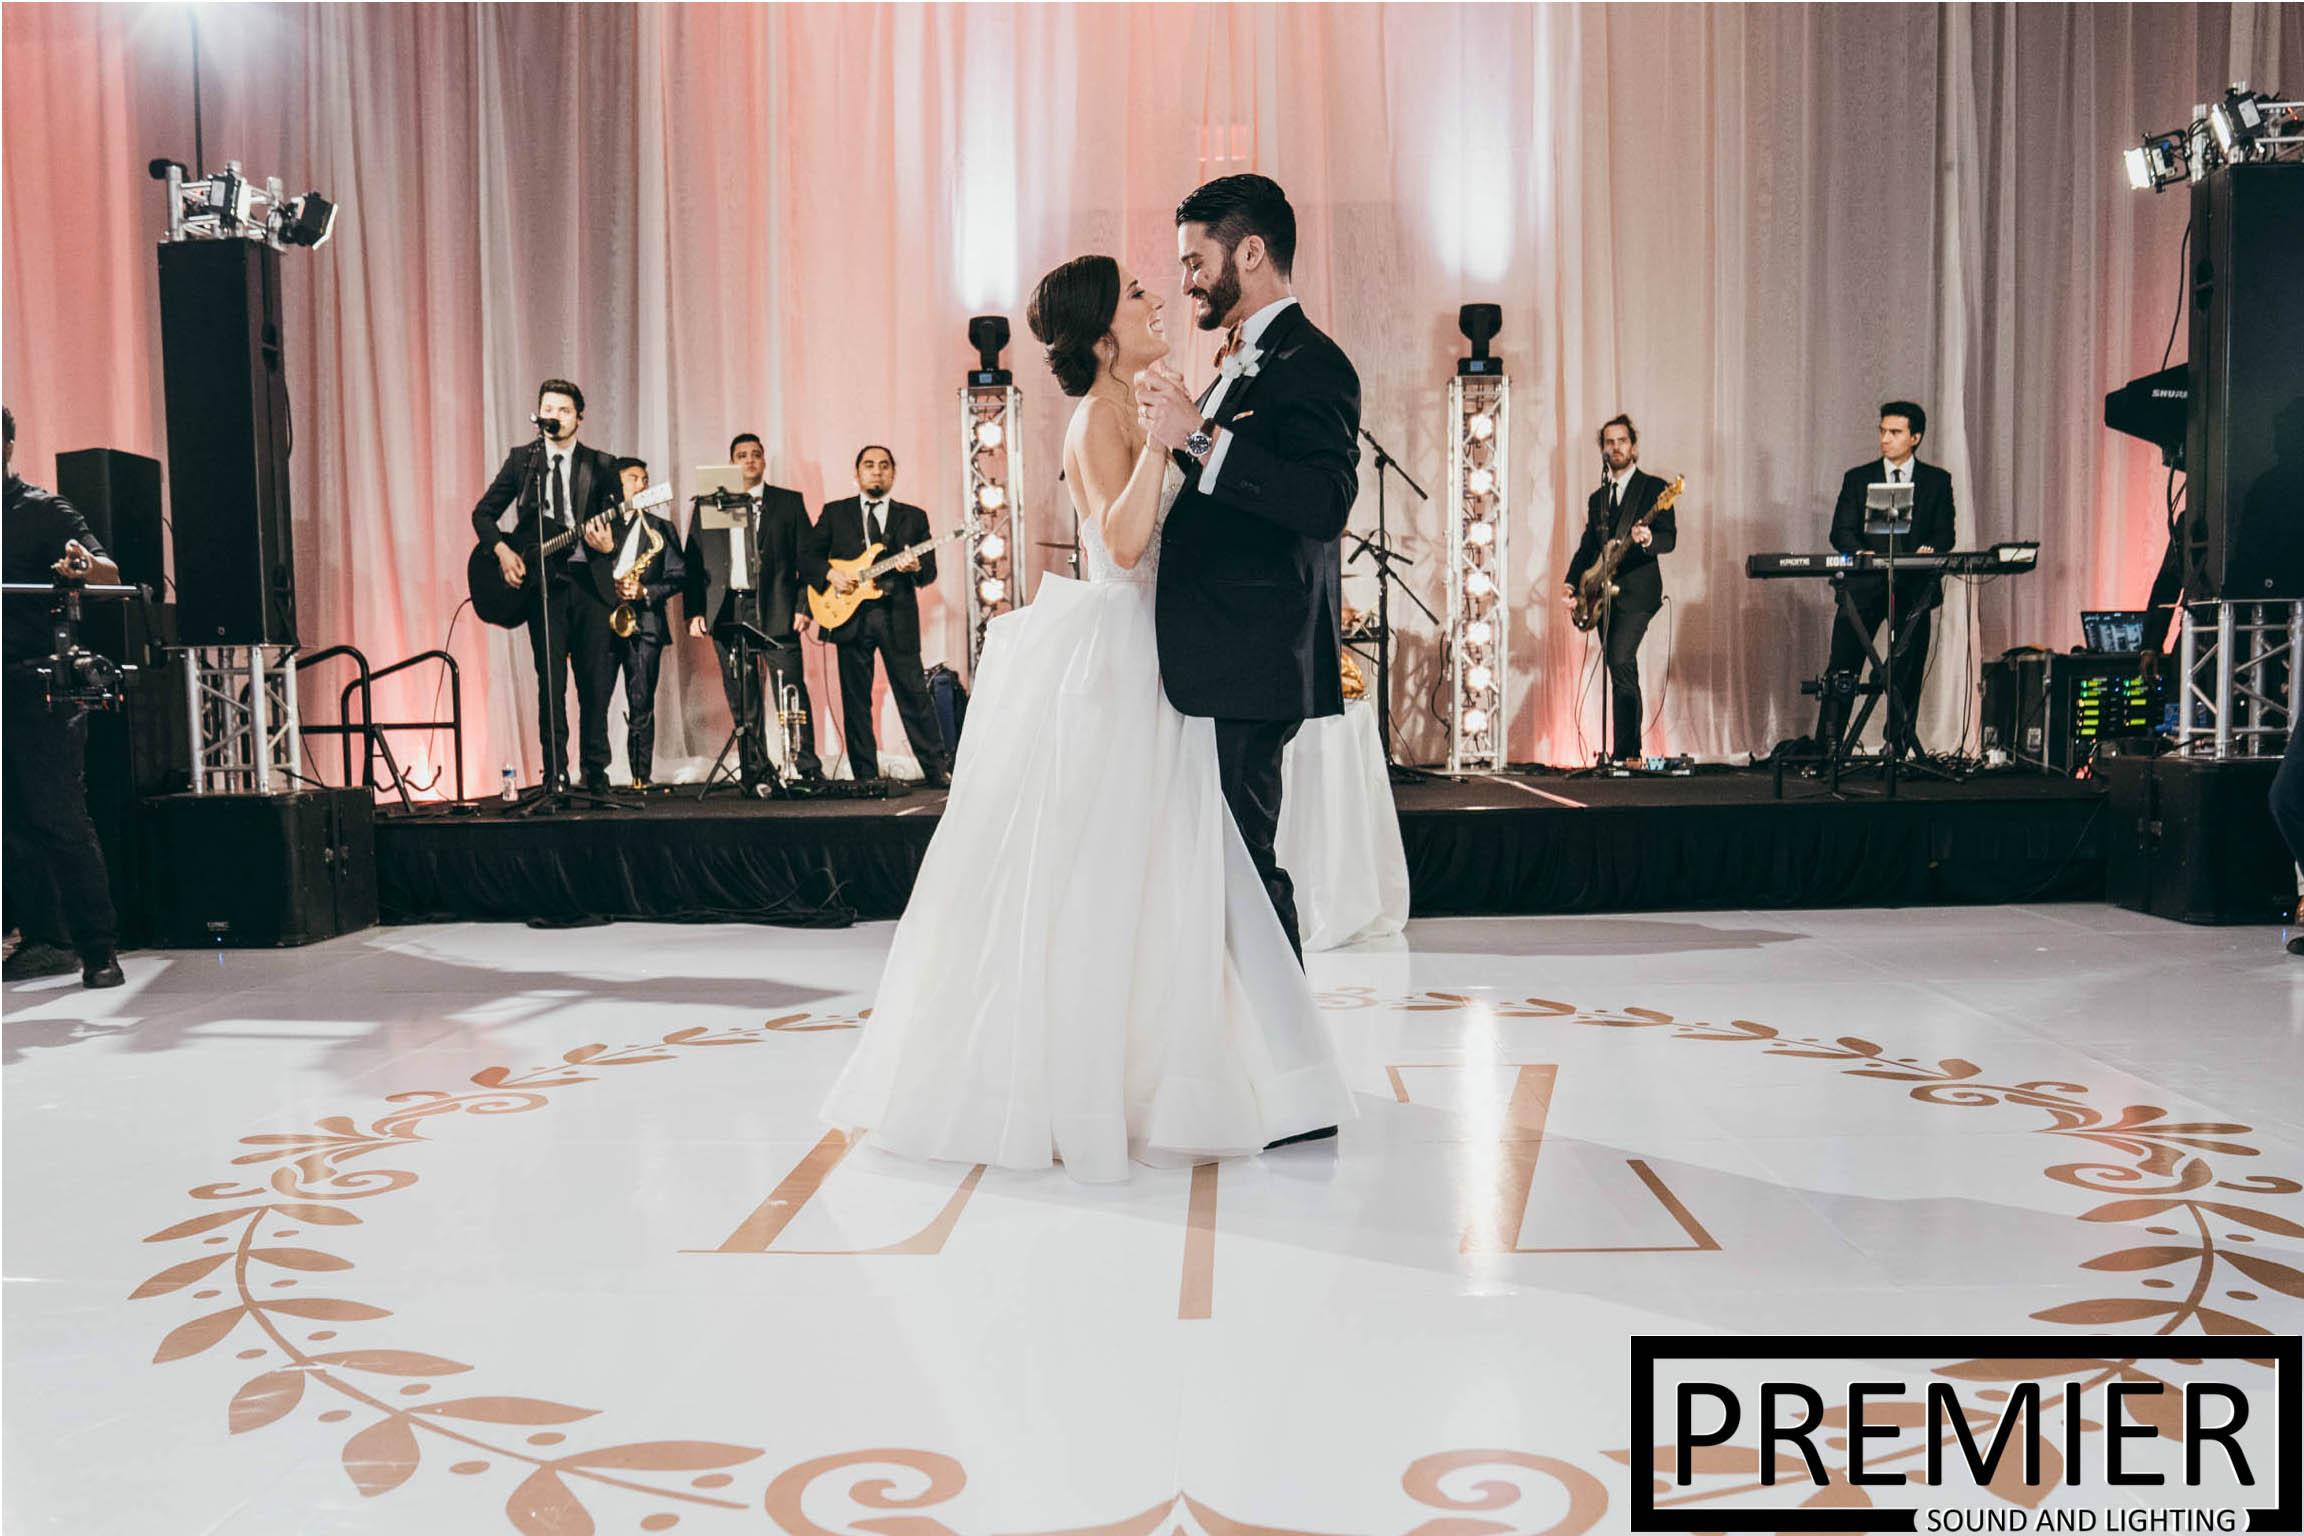 Premier Sound And Lighting Houston Wedding 12